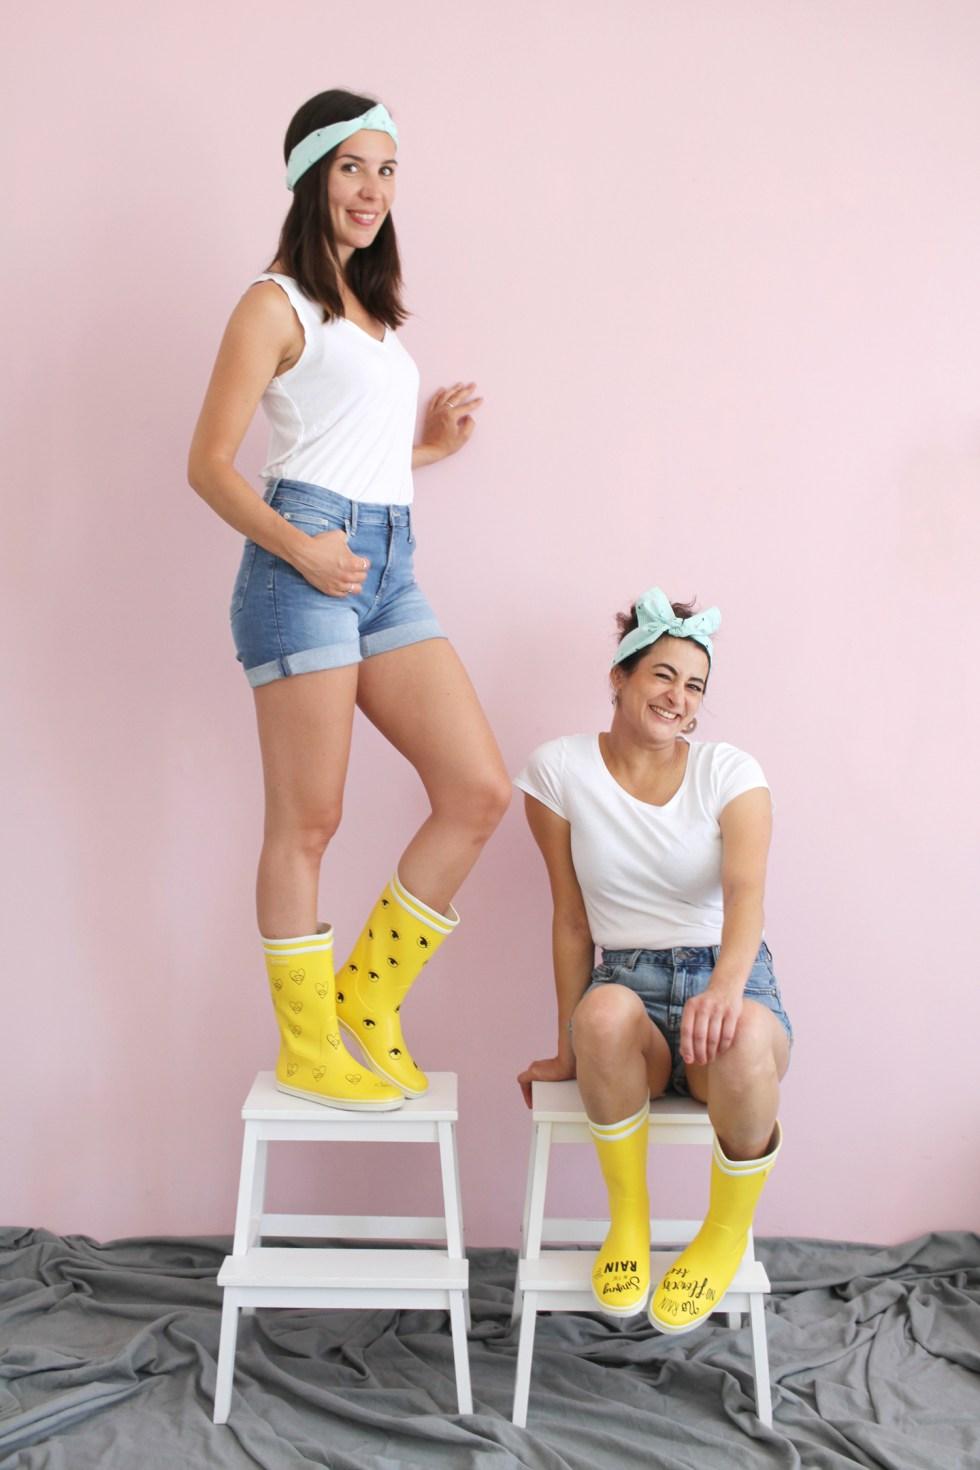 Makerist-DIY-Festival-Outfit-PILOT-PINTOR-31